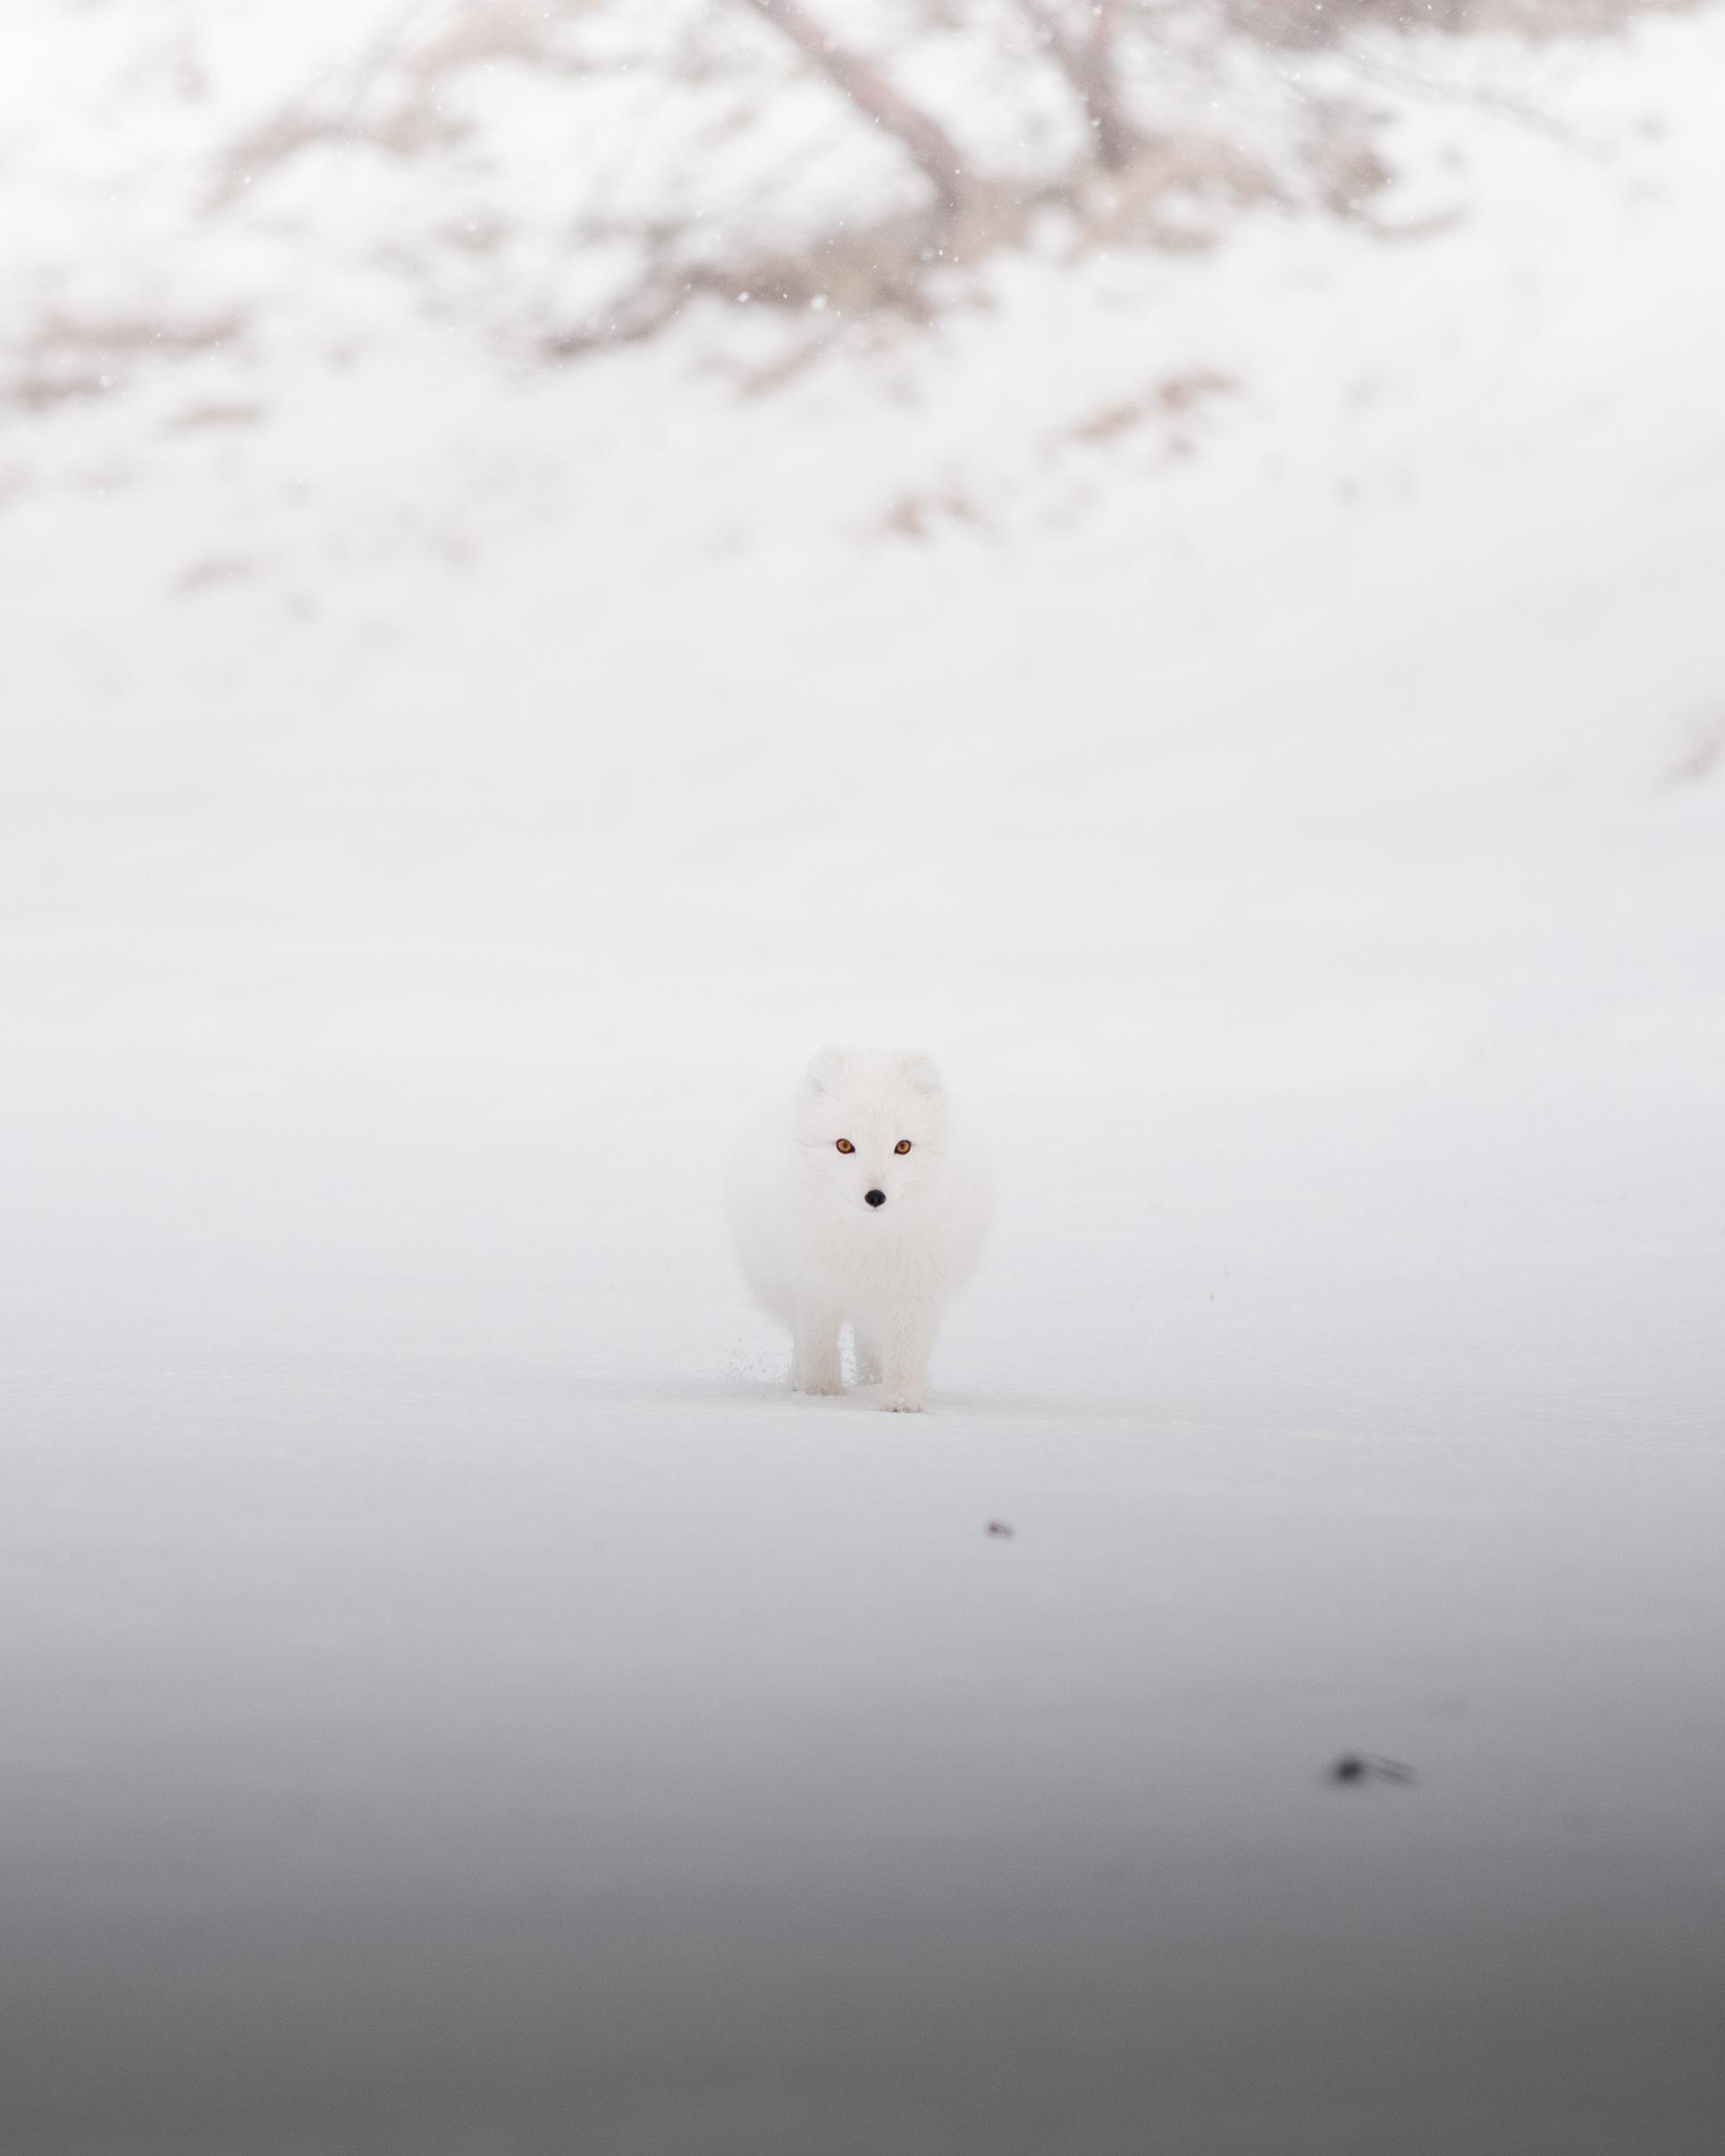 jermiah-schuster-iceland-148.jpg